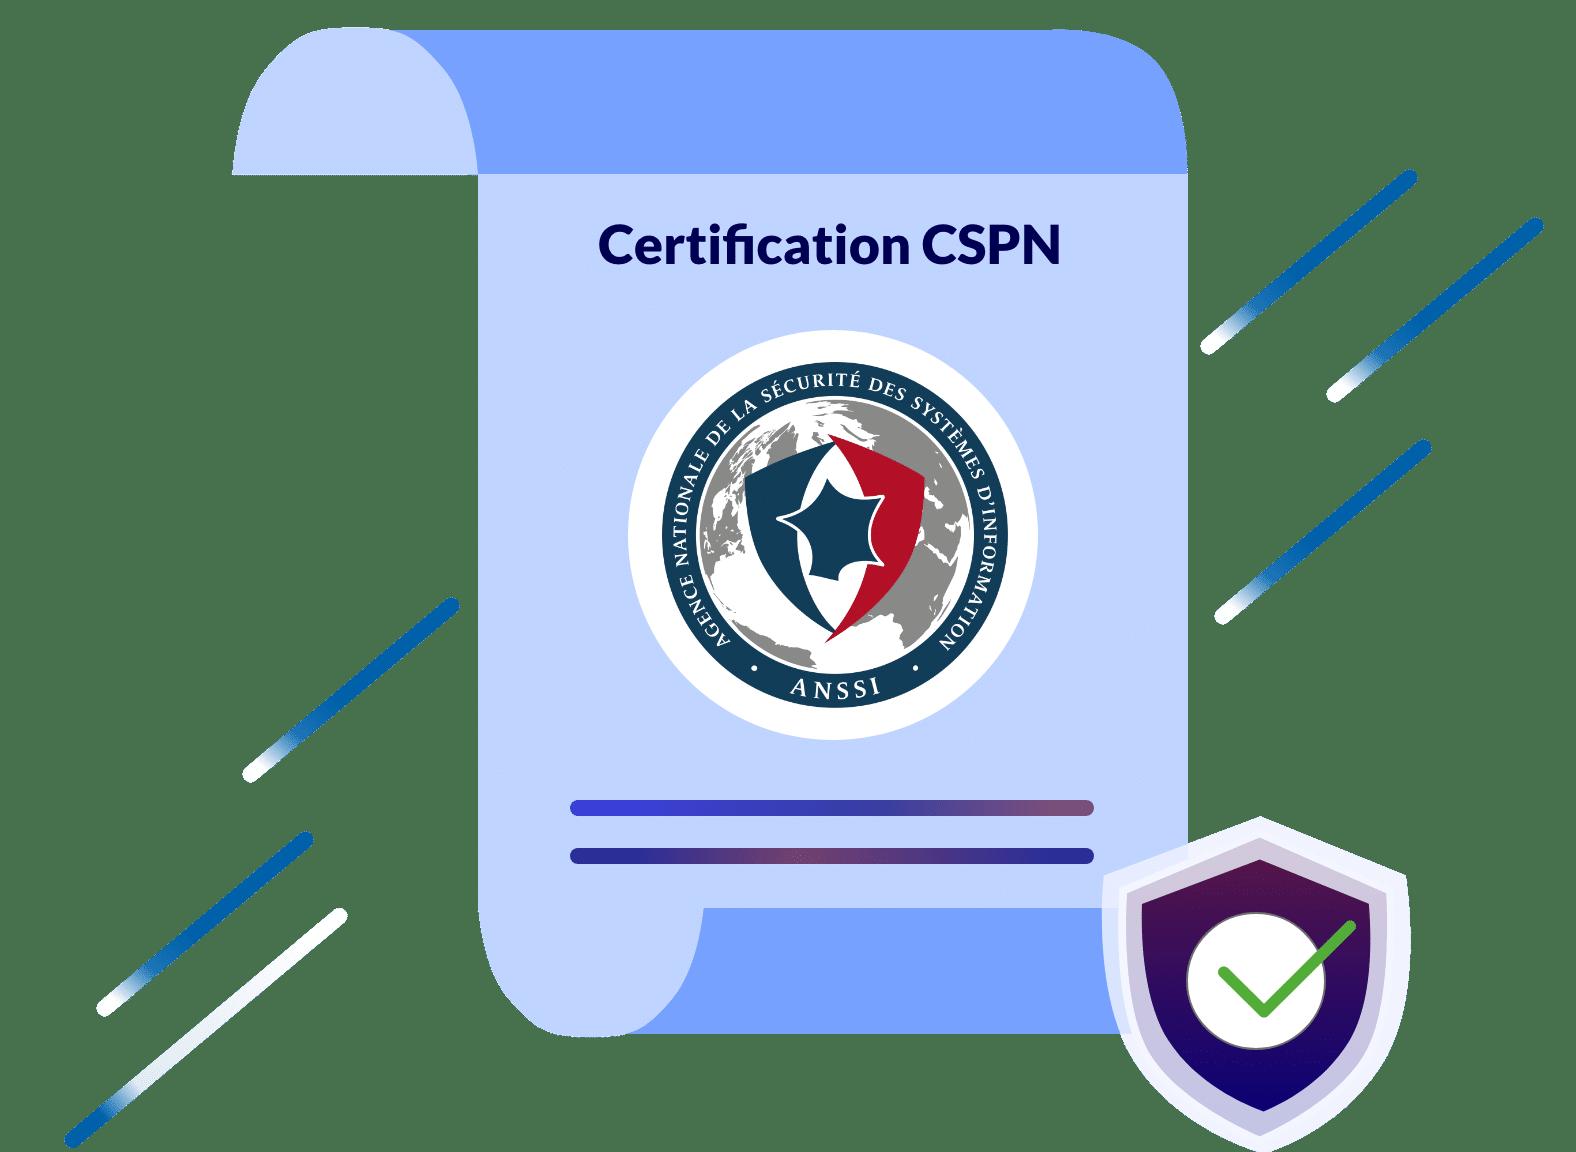 Document Certification CSPN ANSSI